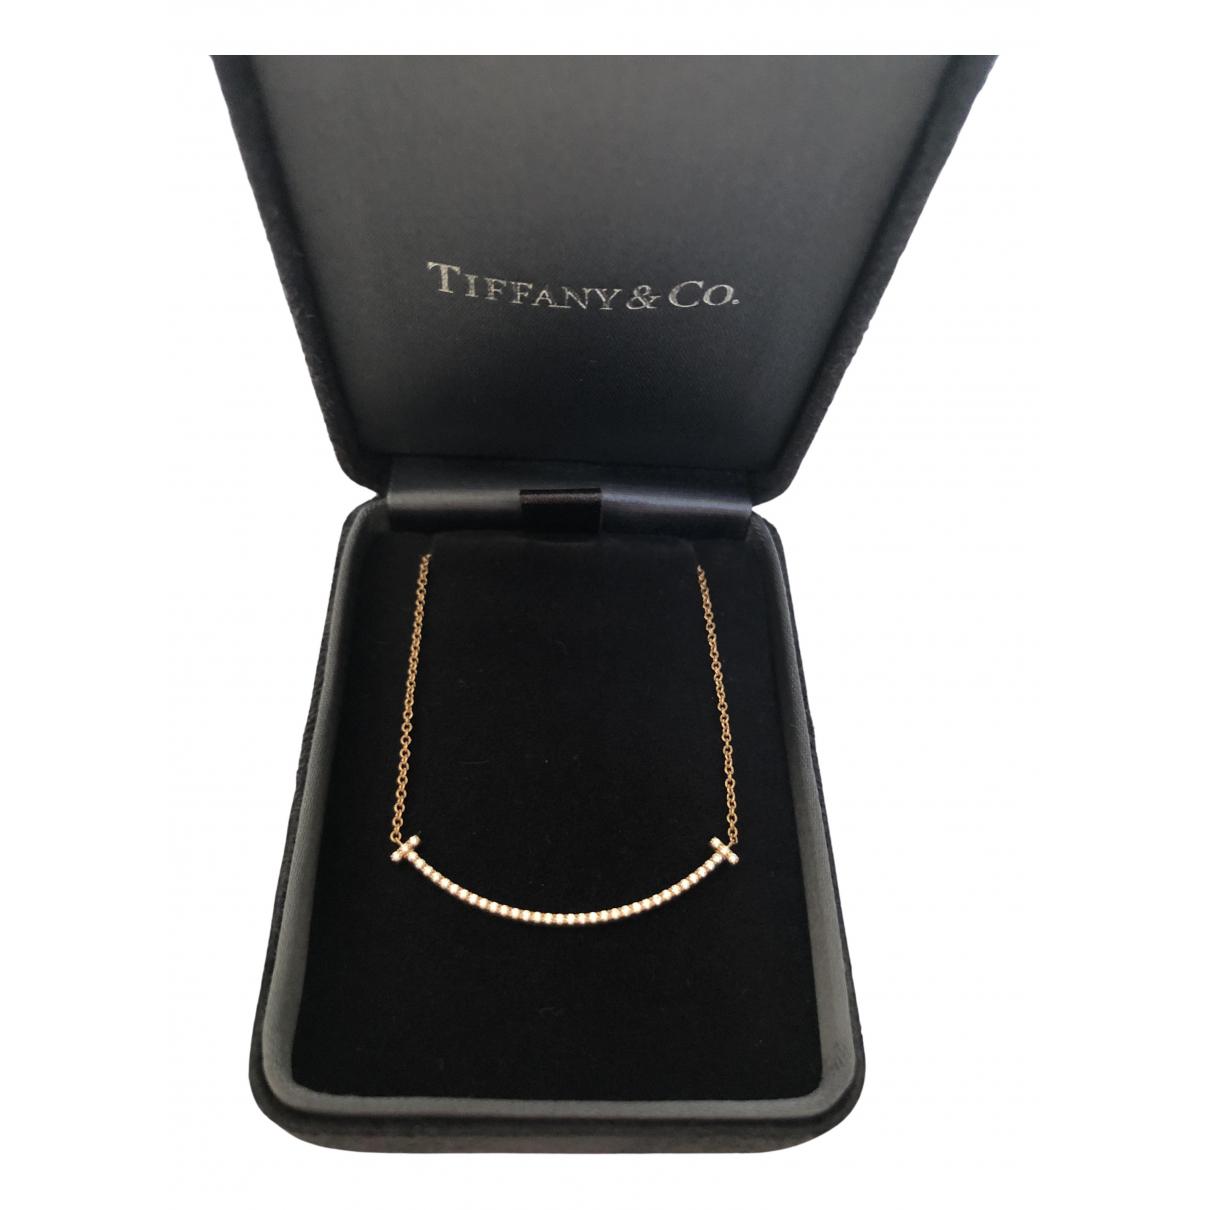 Tiffany & Co - Collier Tiffany T pour femme en or rose - dore